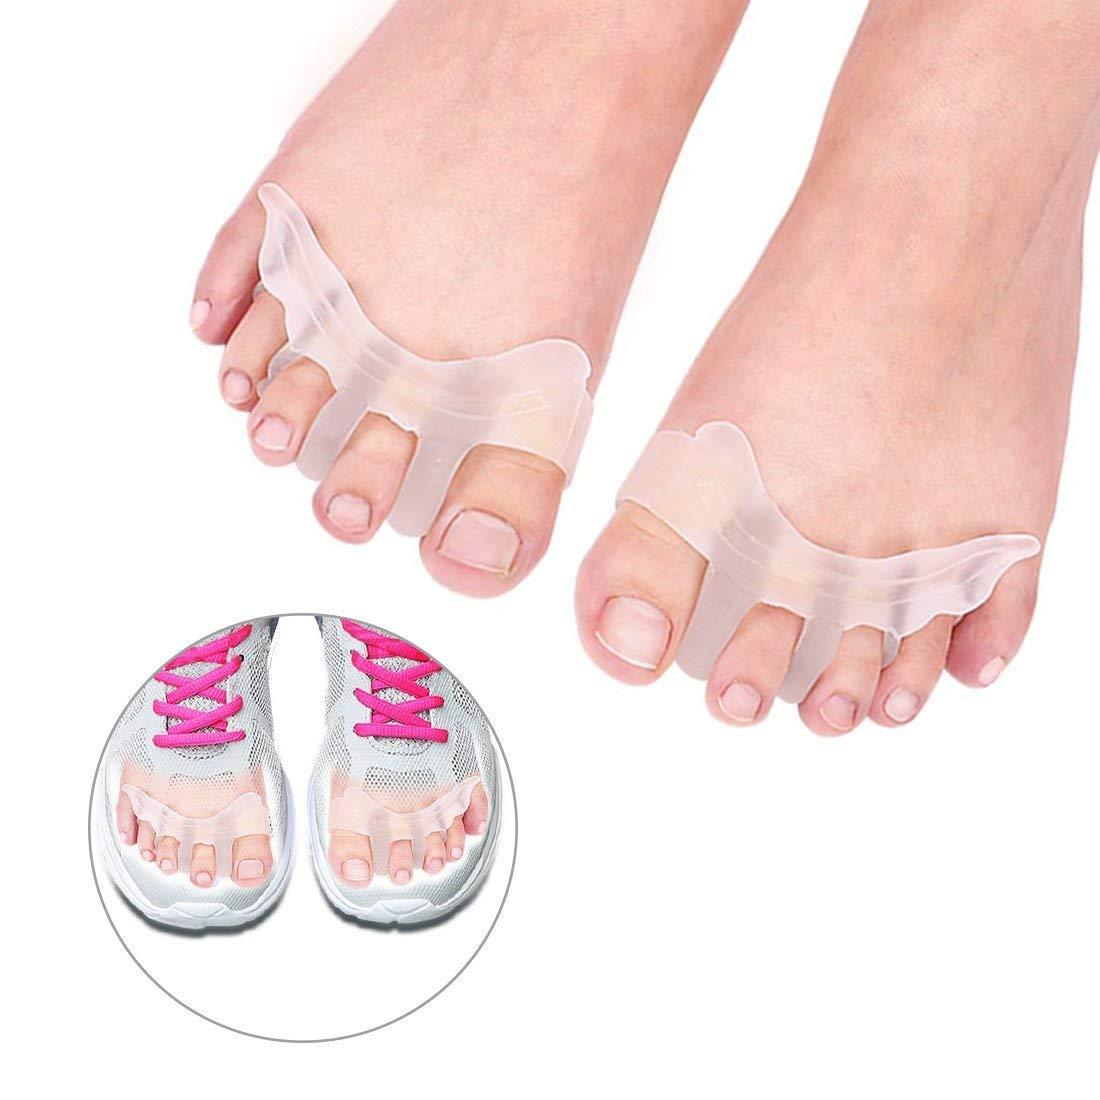 Gel Toe Separators, wohuu Bunion Corrector Splints Relieve Pain of Hallux Valgus, Thumb Pain, Hammer Toe Straightener Fit Women Men